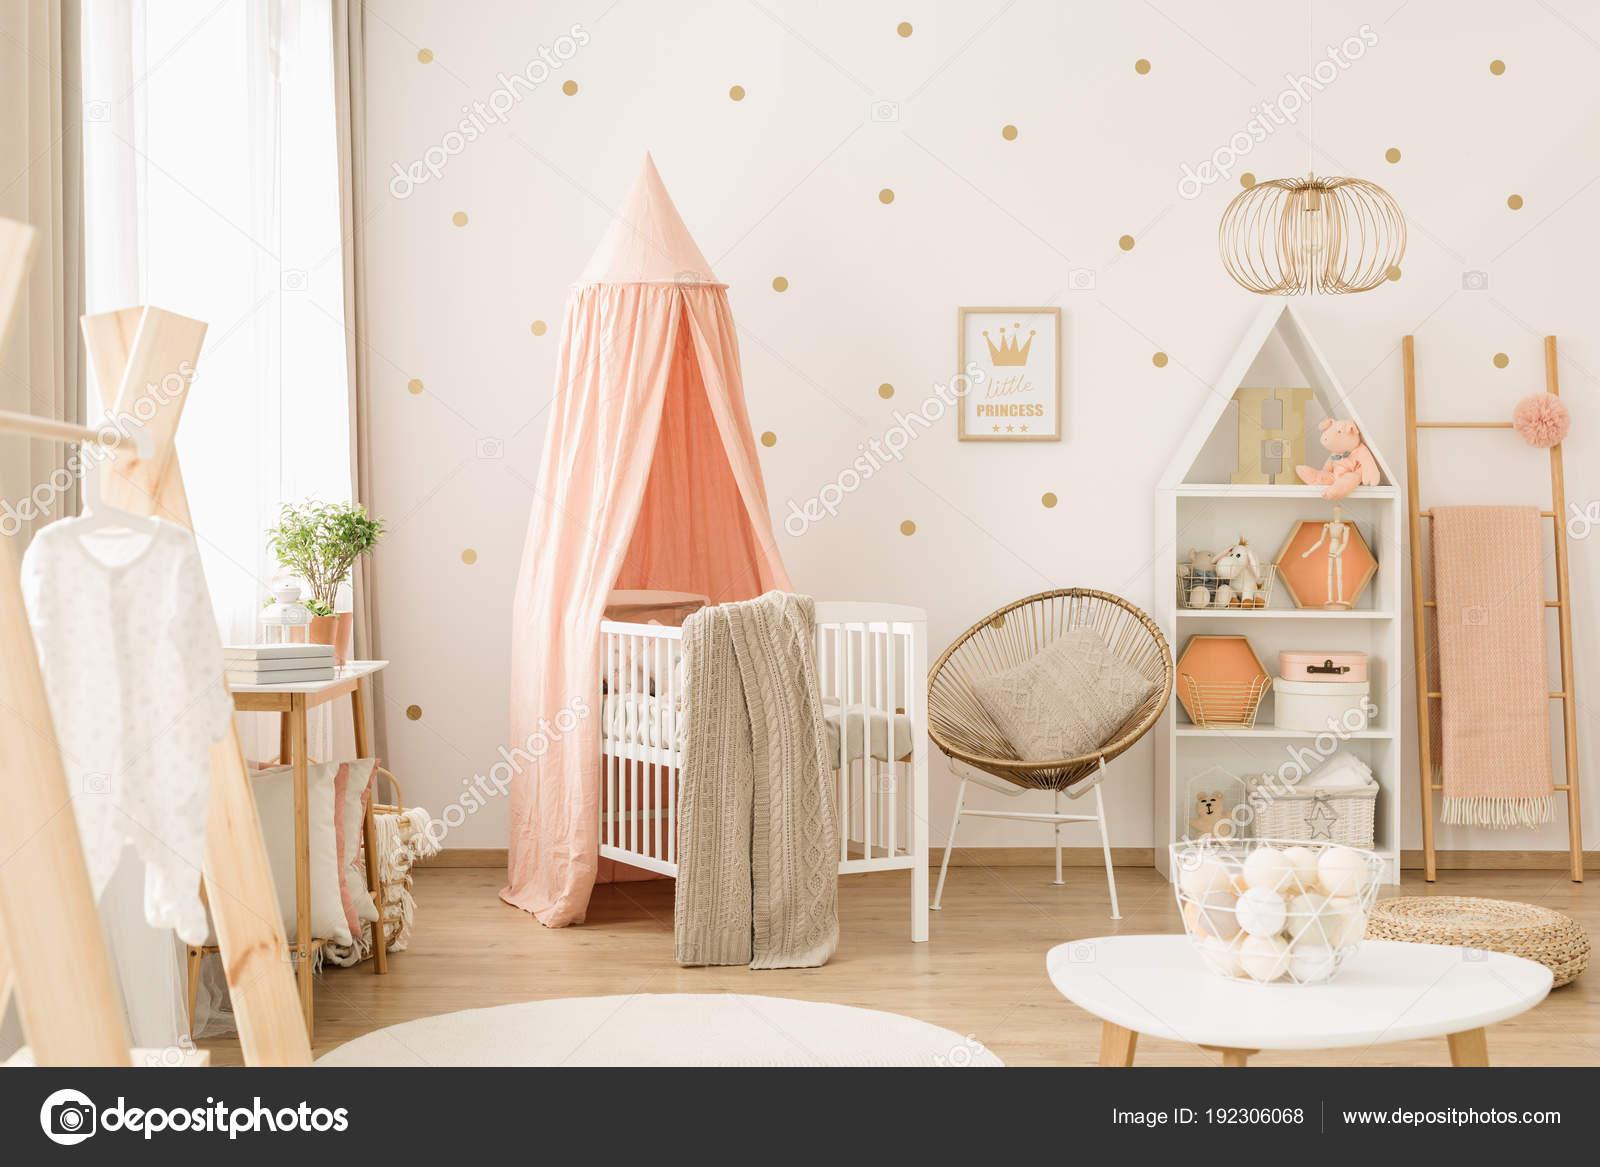 Niedlichen Pastell Rosa Kinderzimmer Stockfoto C Photographee Eu